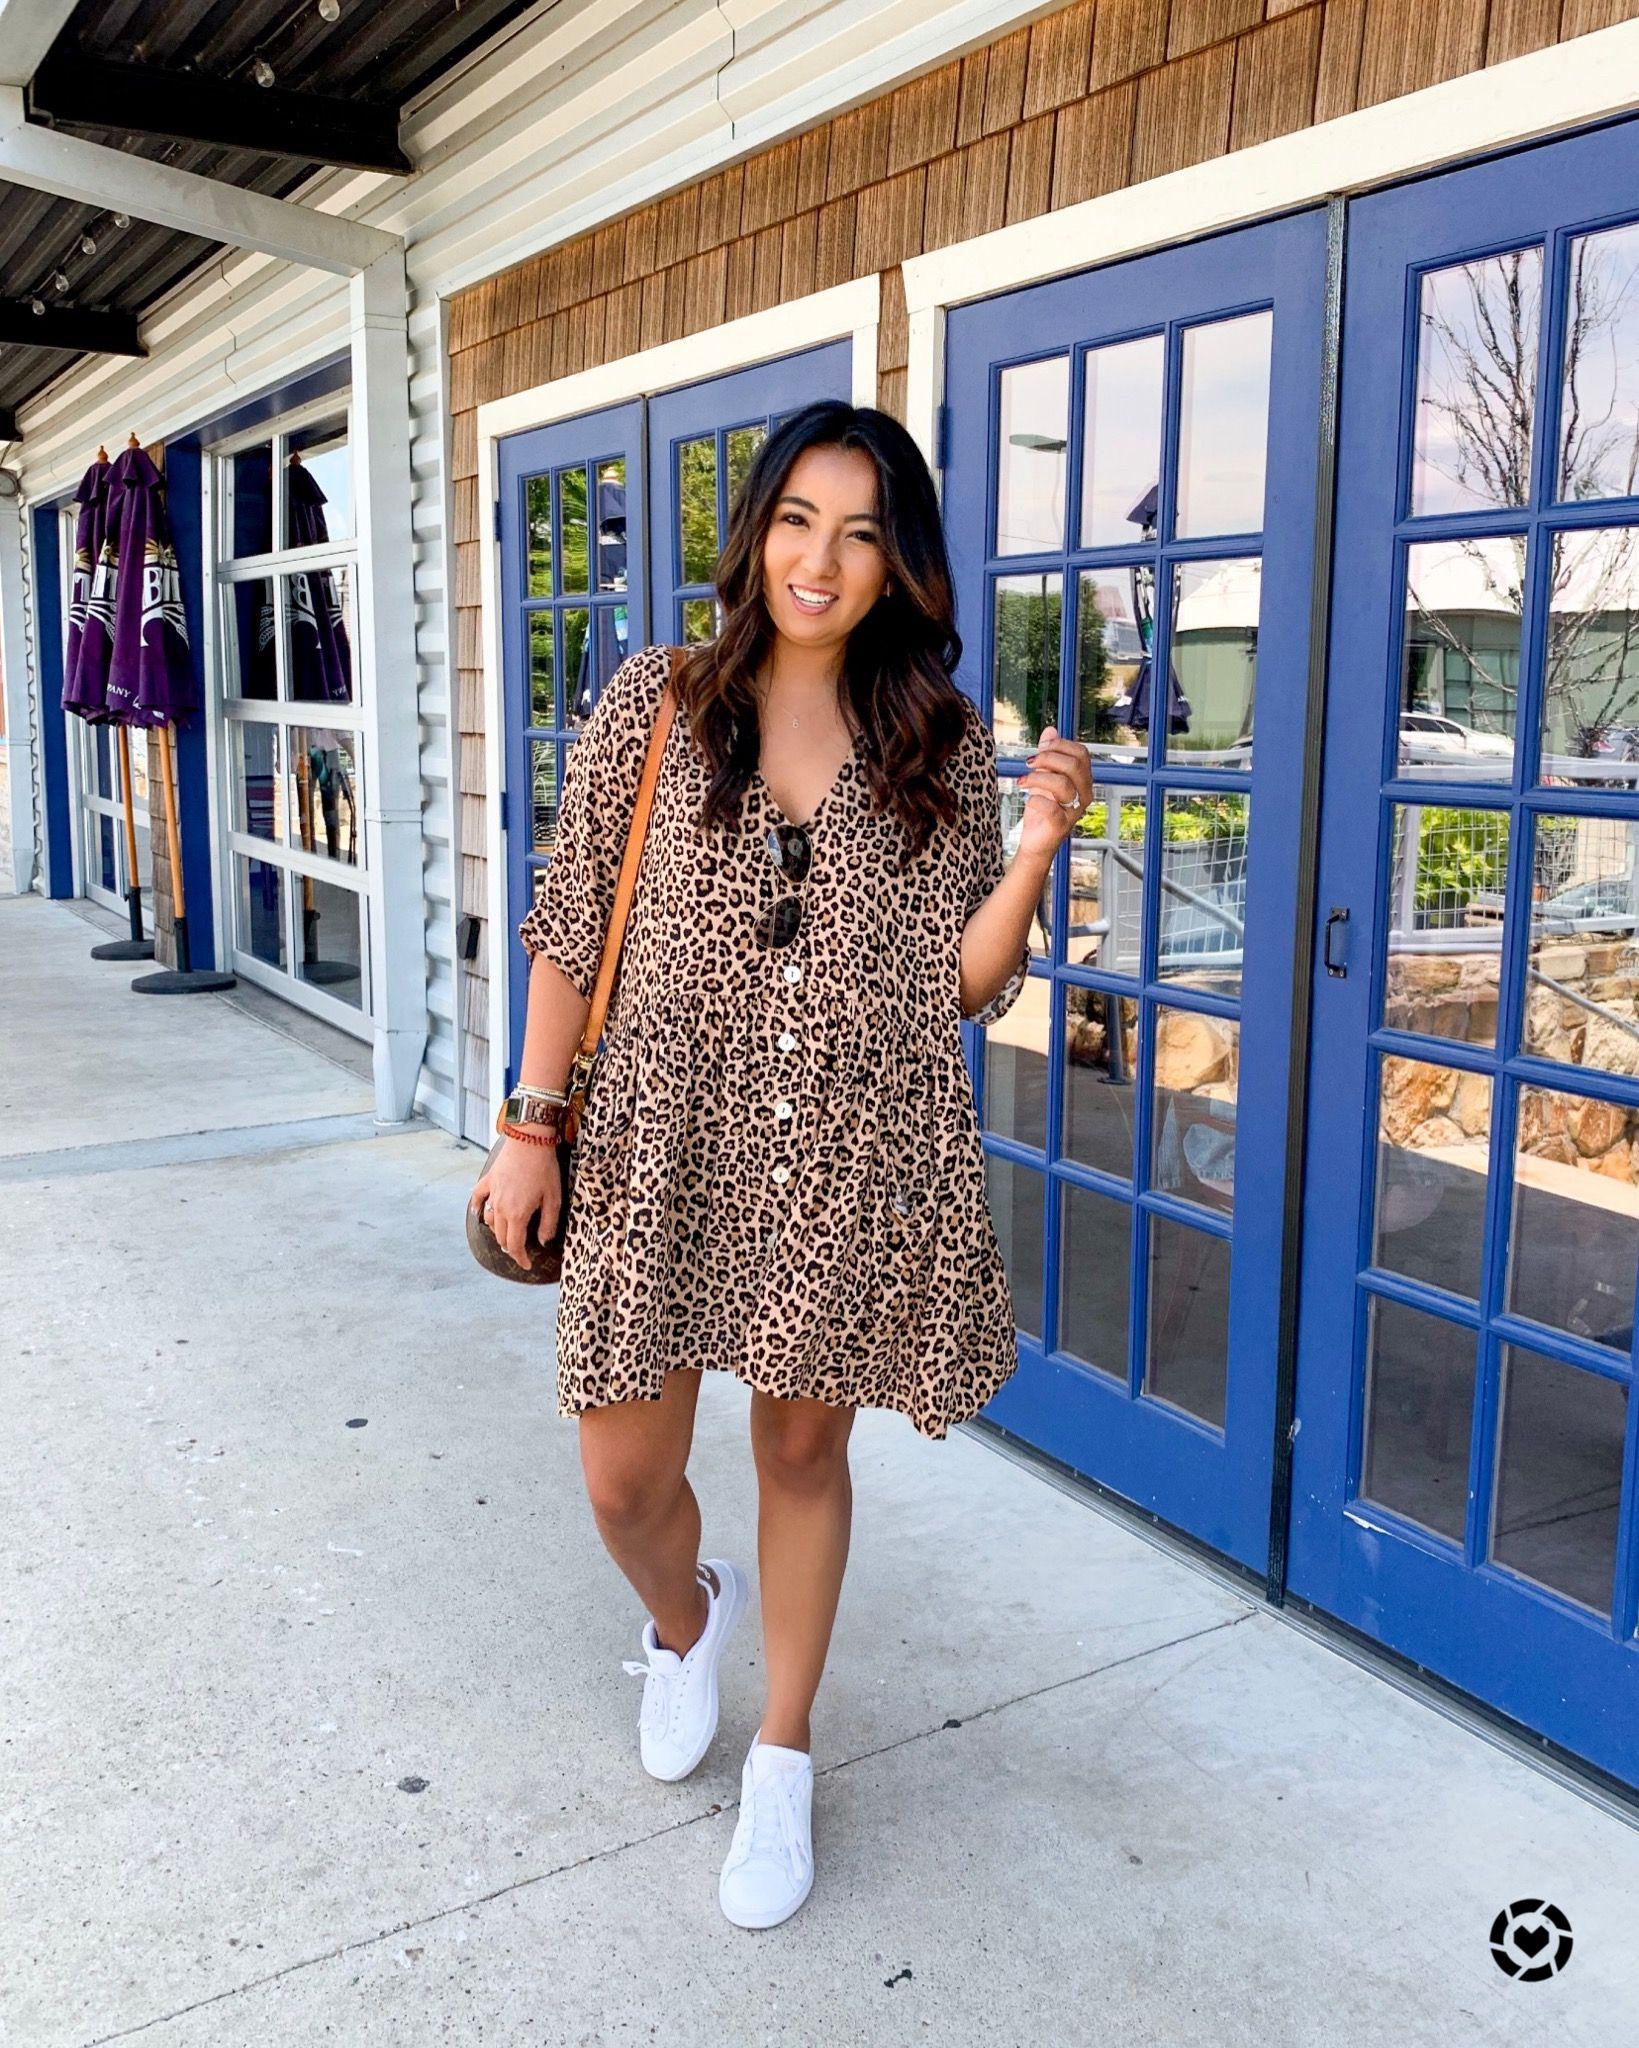 Casual Dress Outfit Ideas Leopard Print Dress Dress And Sneakers Outfit White Sneakers Outfit Leopard Print Dress Outfit [ 2048 x 1639 Pixel ]